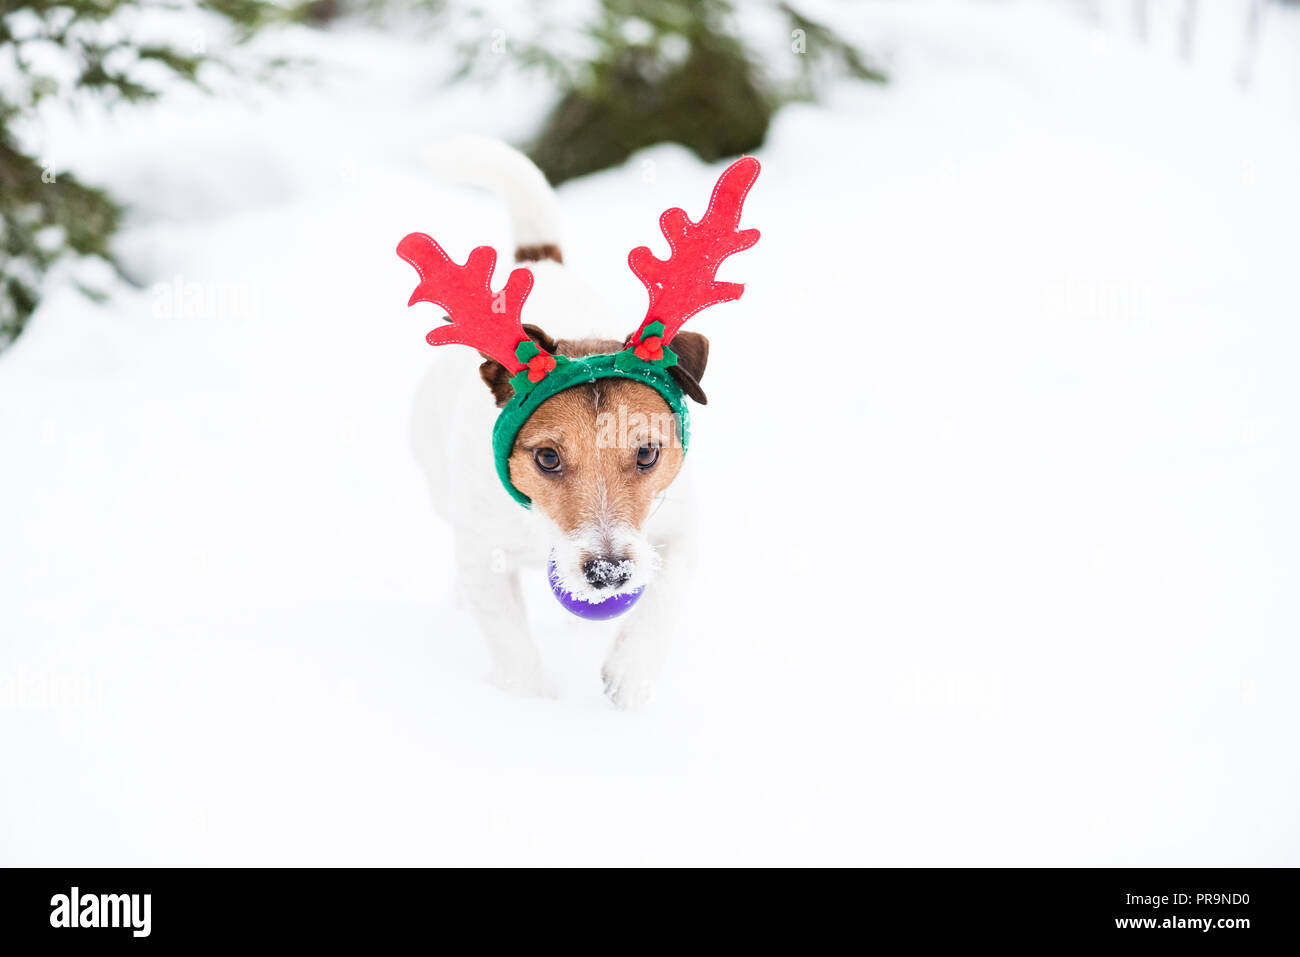 Hund als humorvoll Rentier holt Christmas tree Ball Spielzeug Stockbild